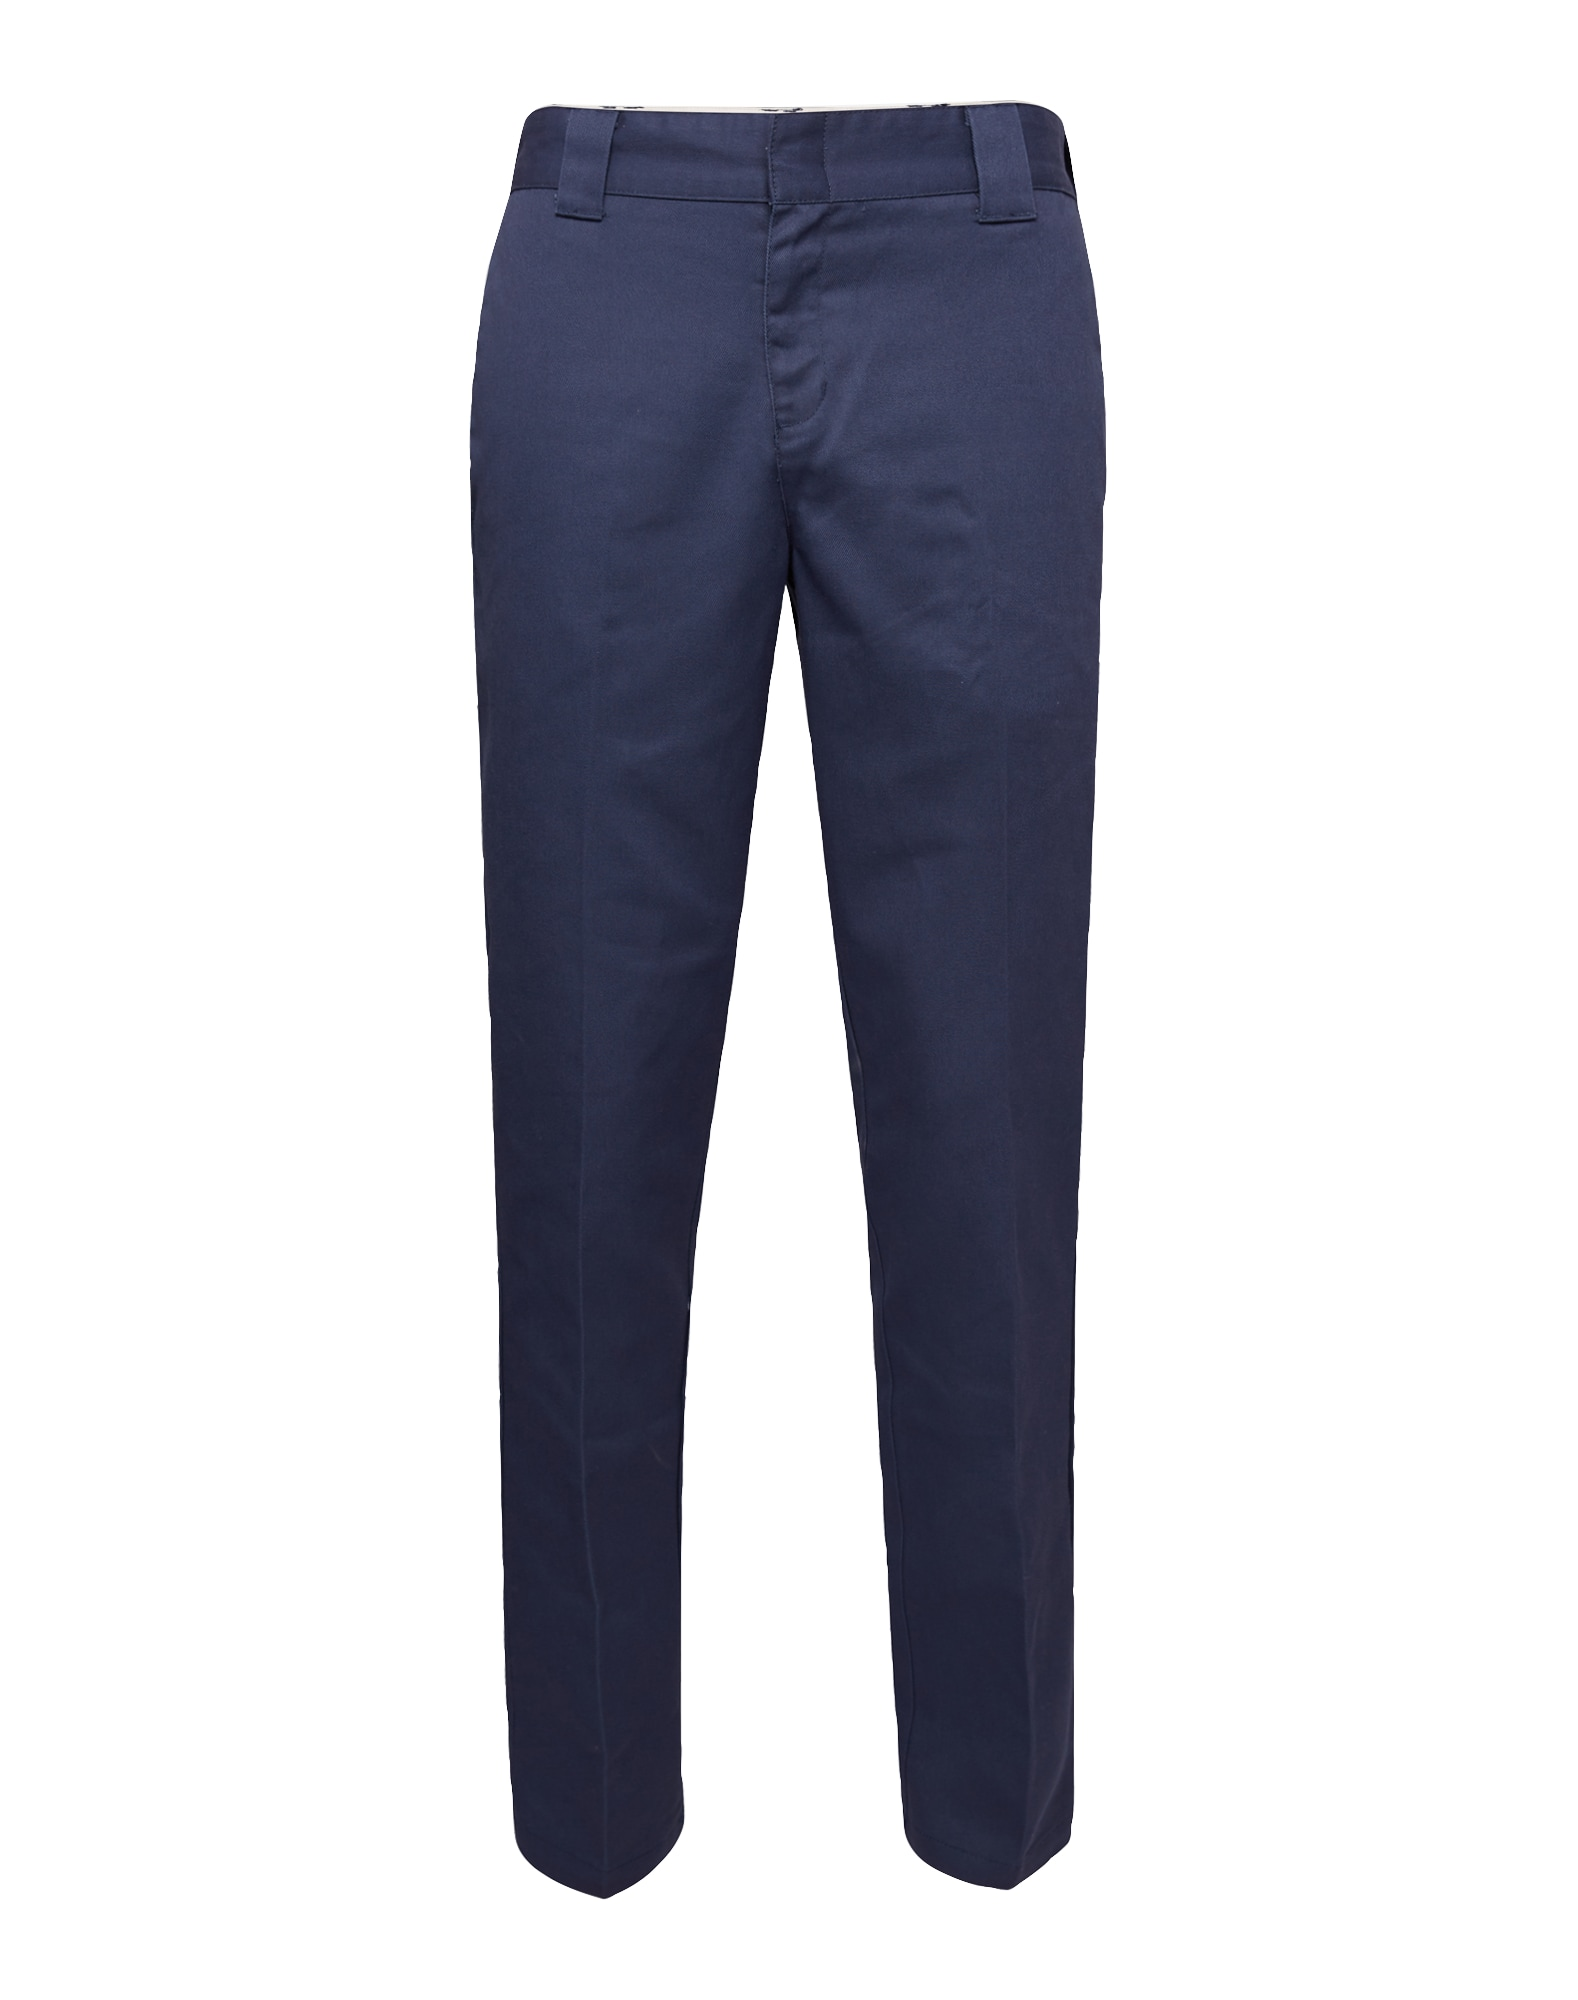 Chino kalhoty námořnická modř DICKIES